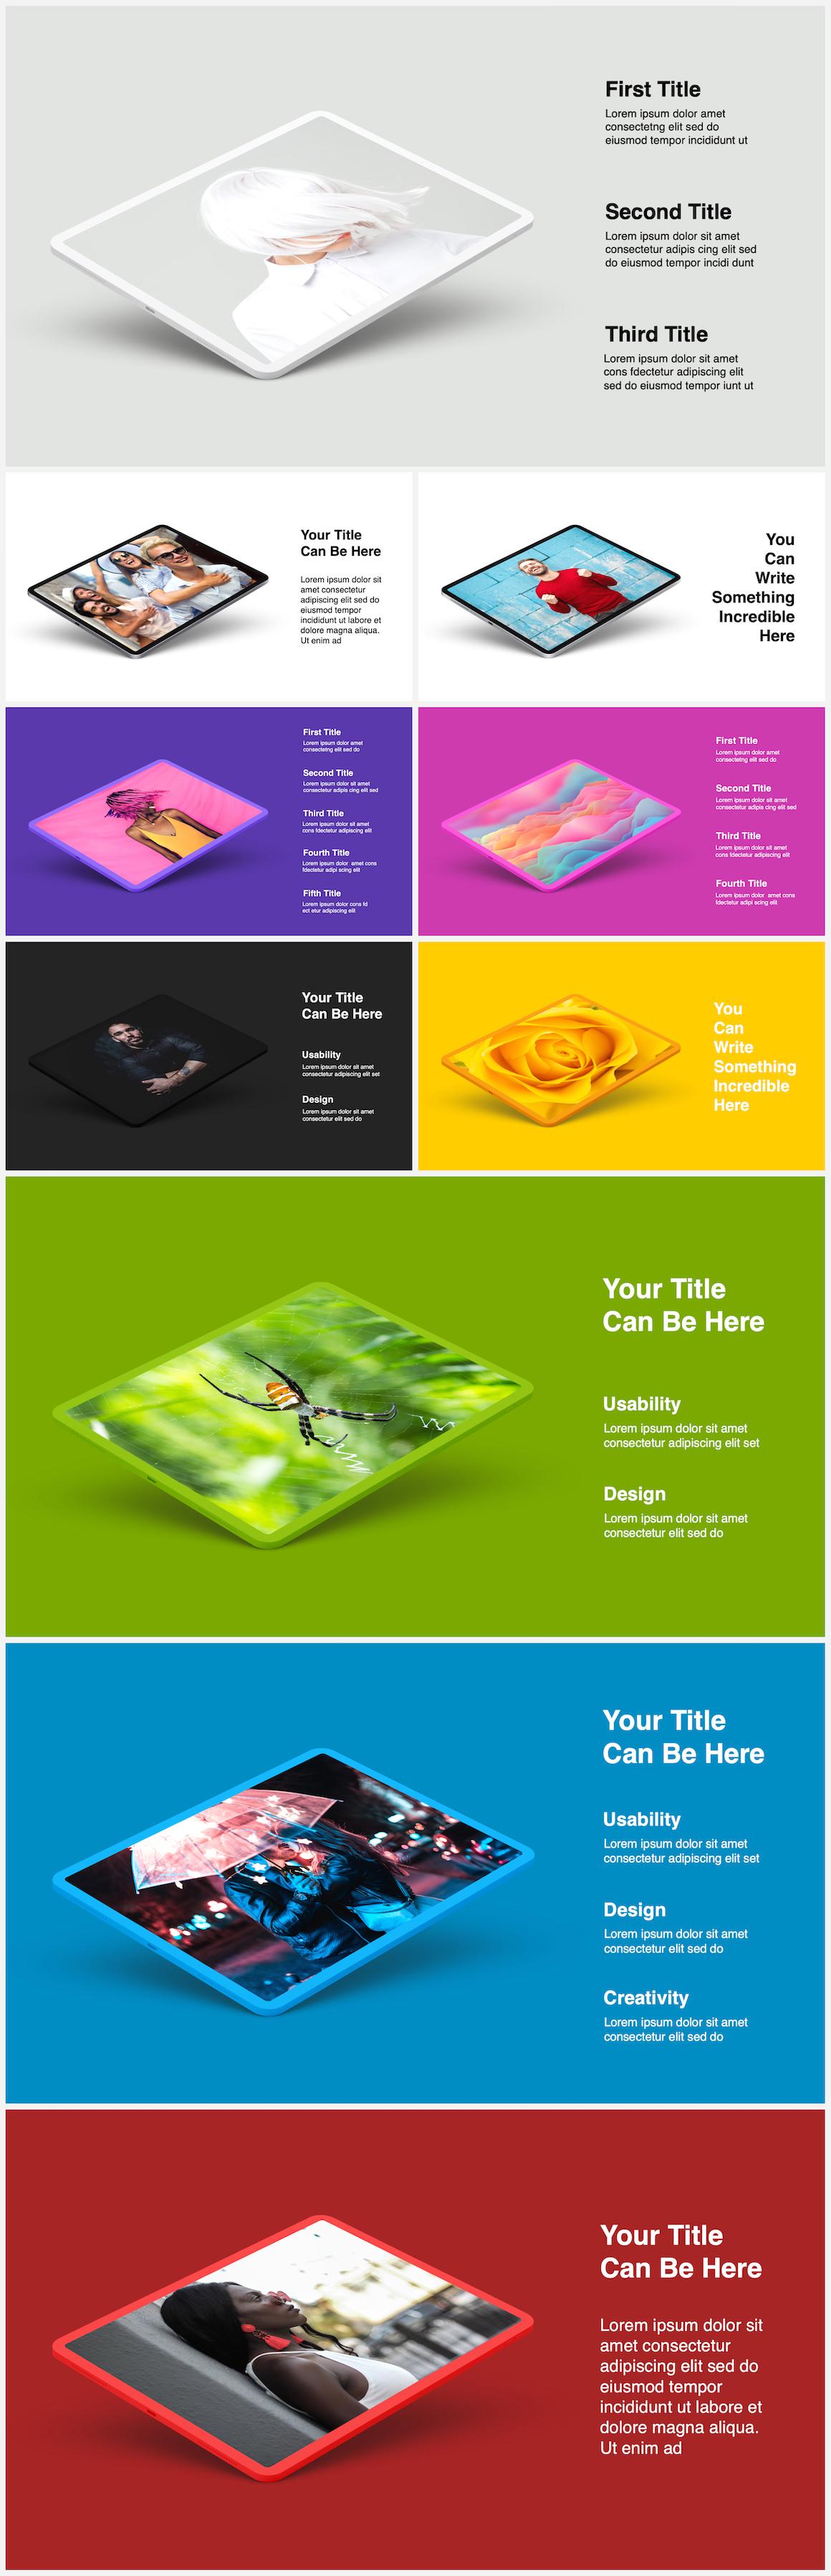 Huge Infographics Bundle! Lifetime Updates! PowerPoint, Photoshop, Illustrator. - 84